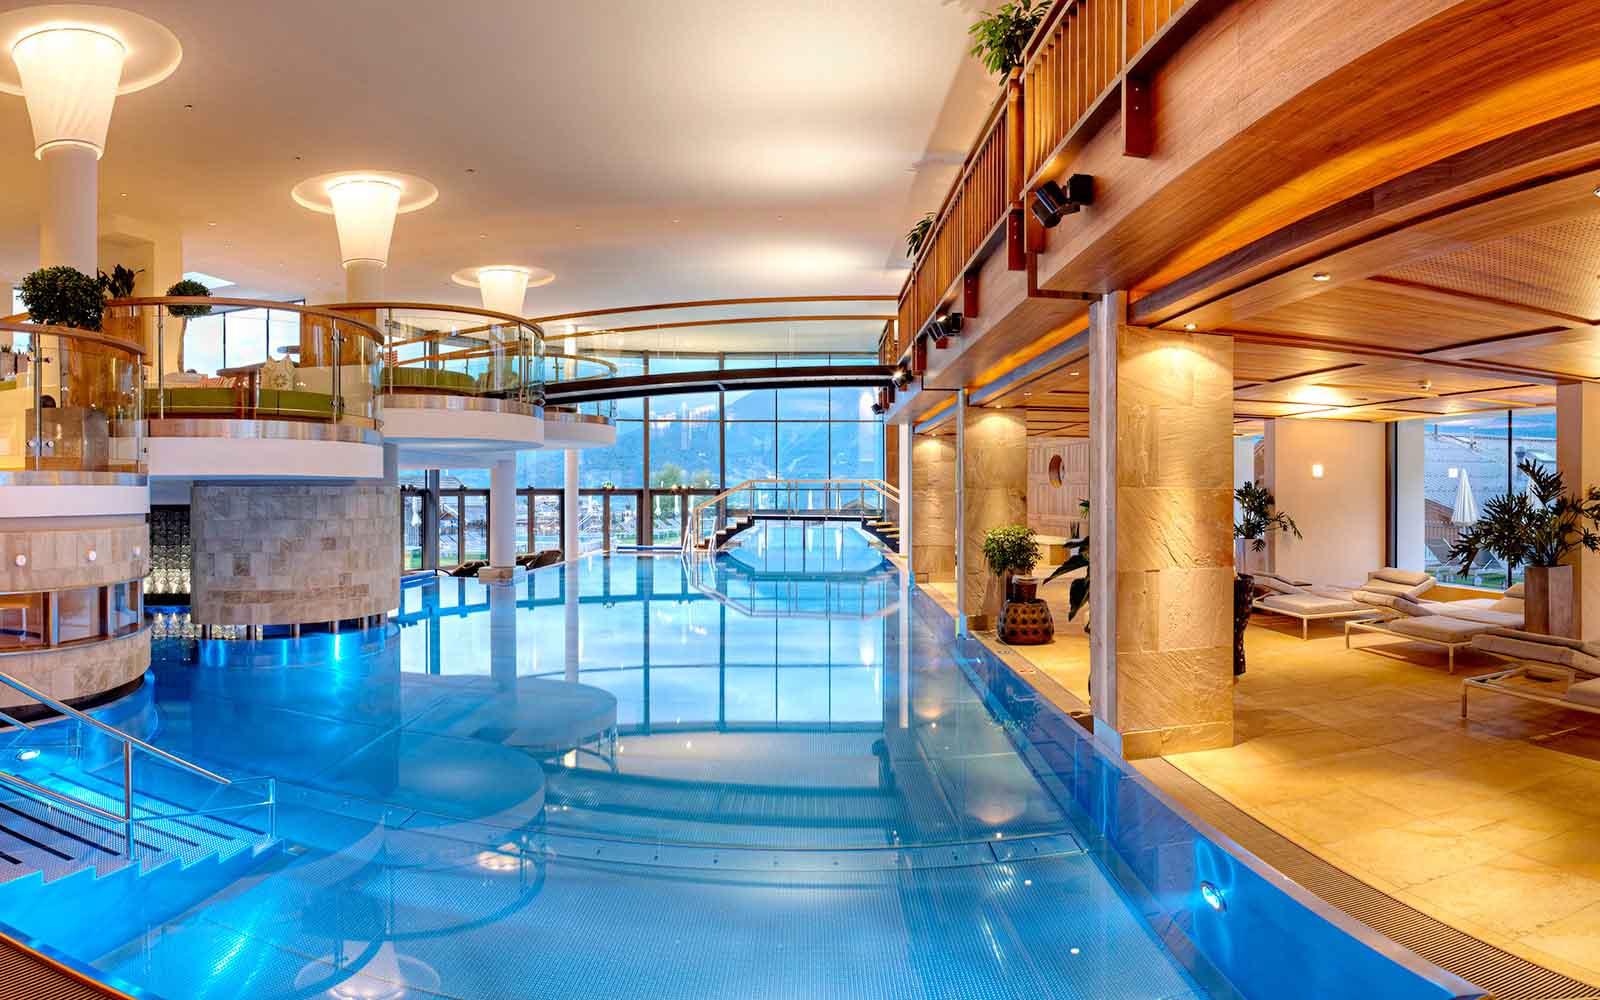 Schlosshotel Fiss Serfaus-Fiss-Ladis Tyrol Austria